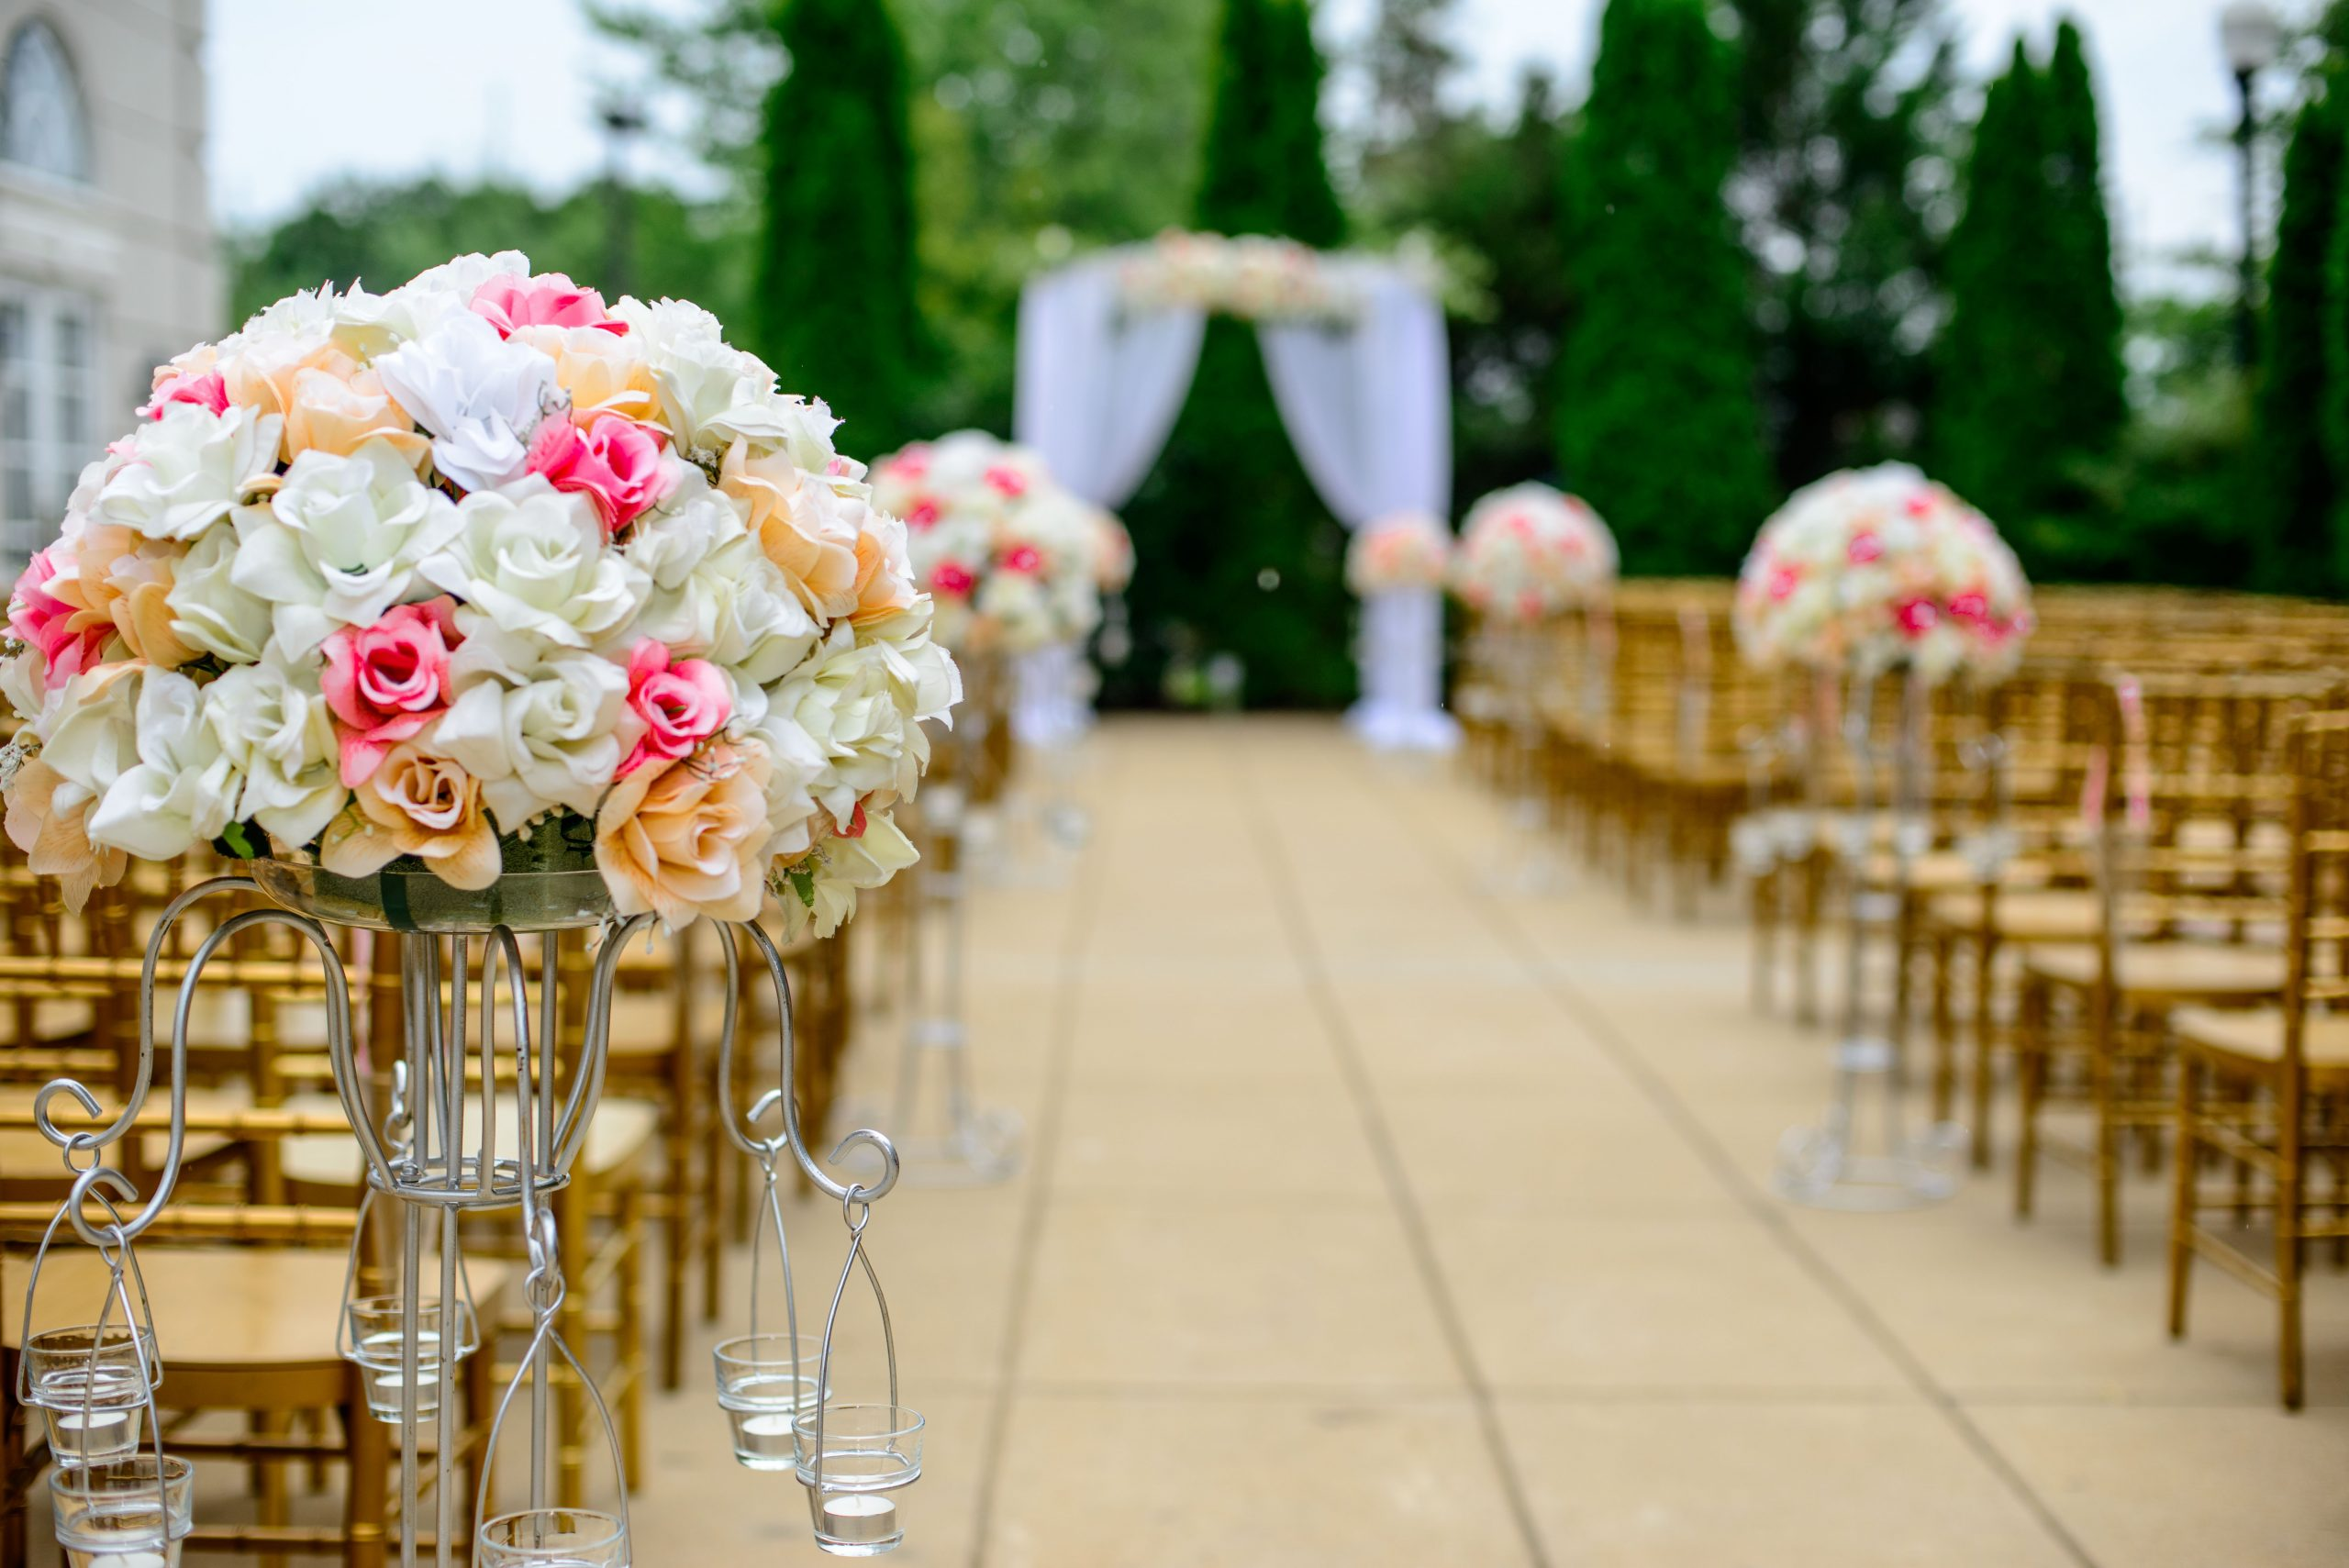 Аладин сватба параклис на Лас Вегас: брак средиземноморски стил